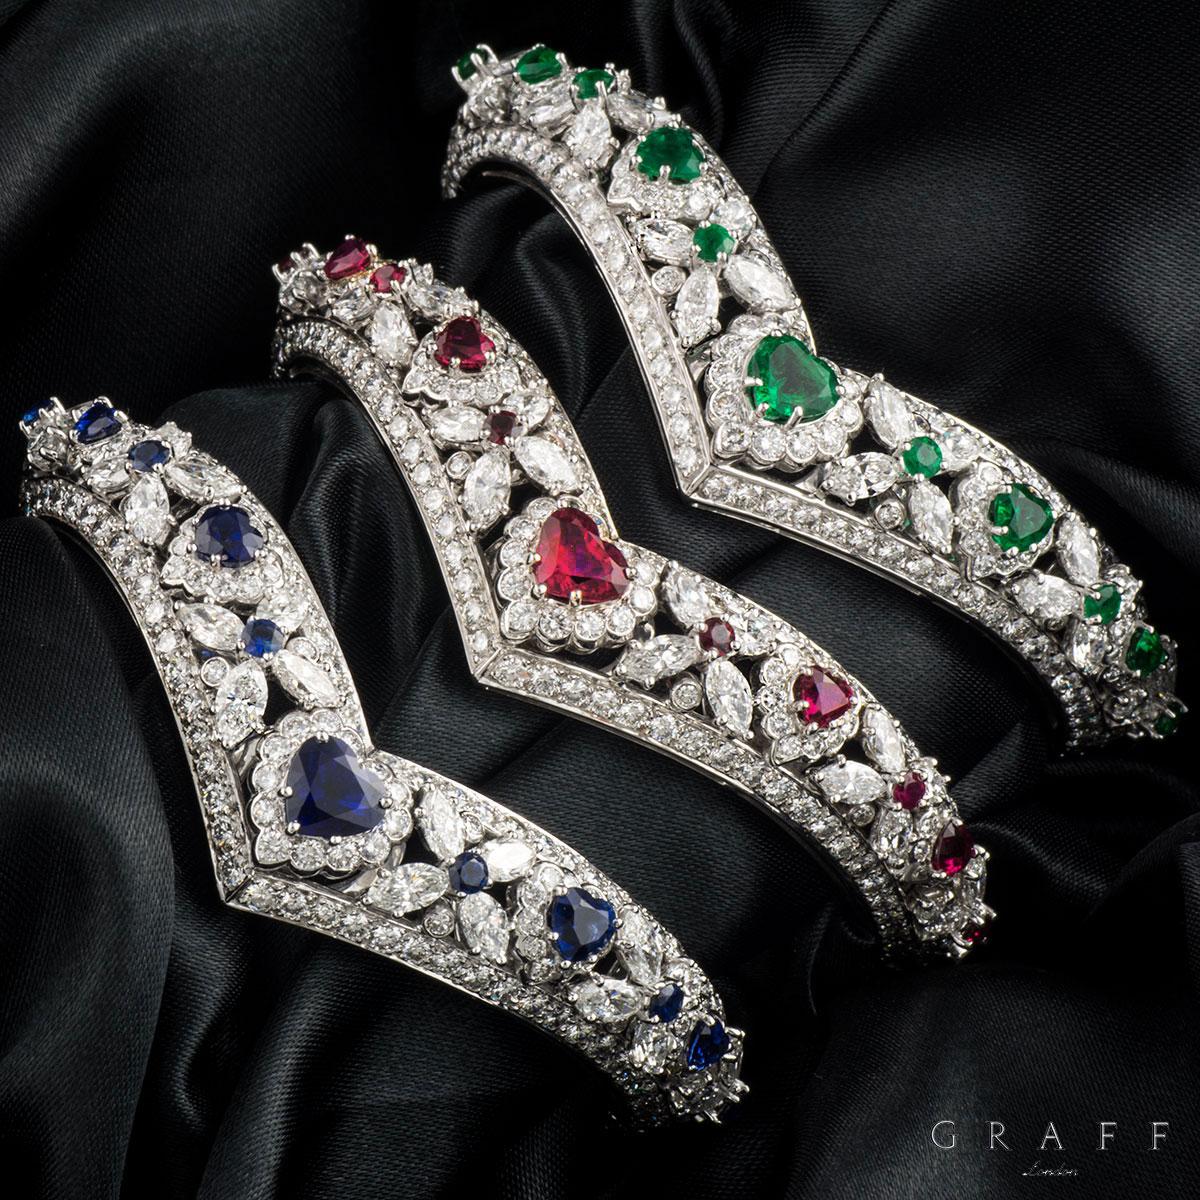 Buy  sell Preowned Unworn Asprey Bvlgari Cartier